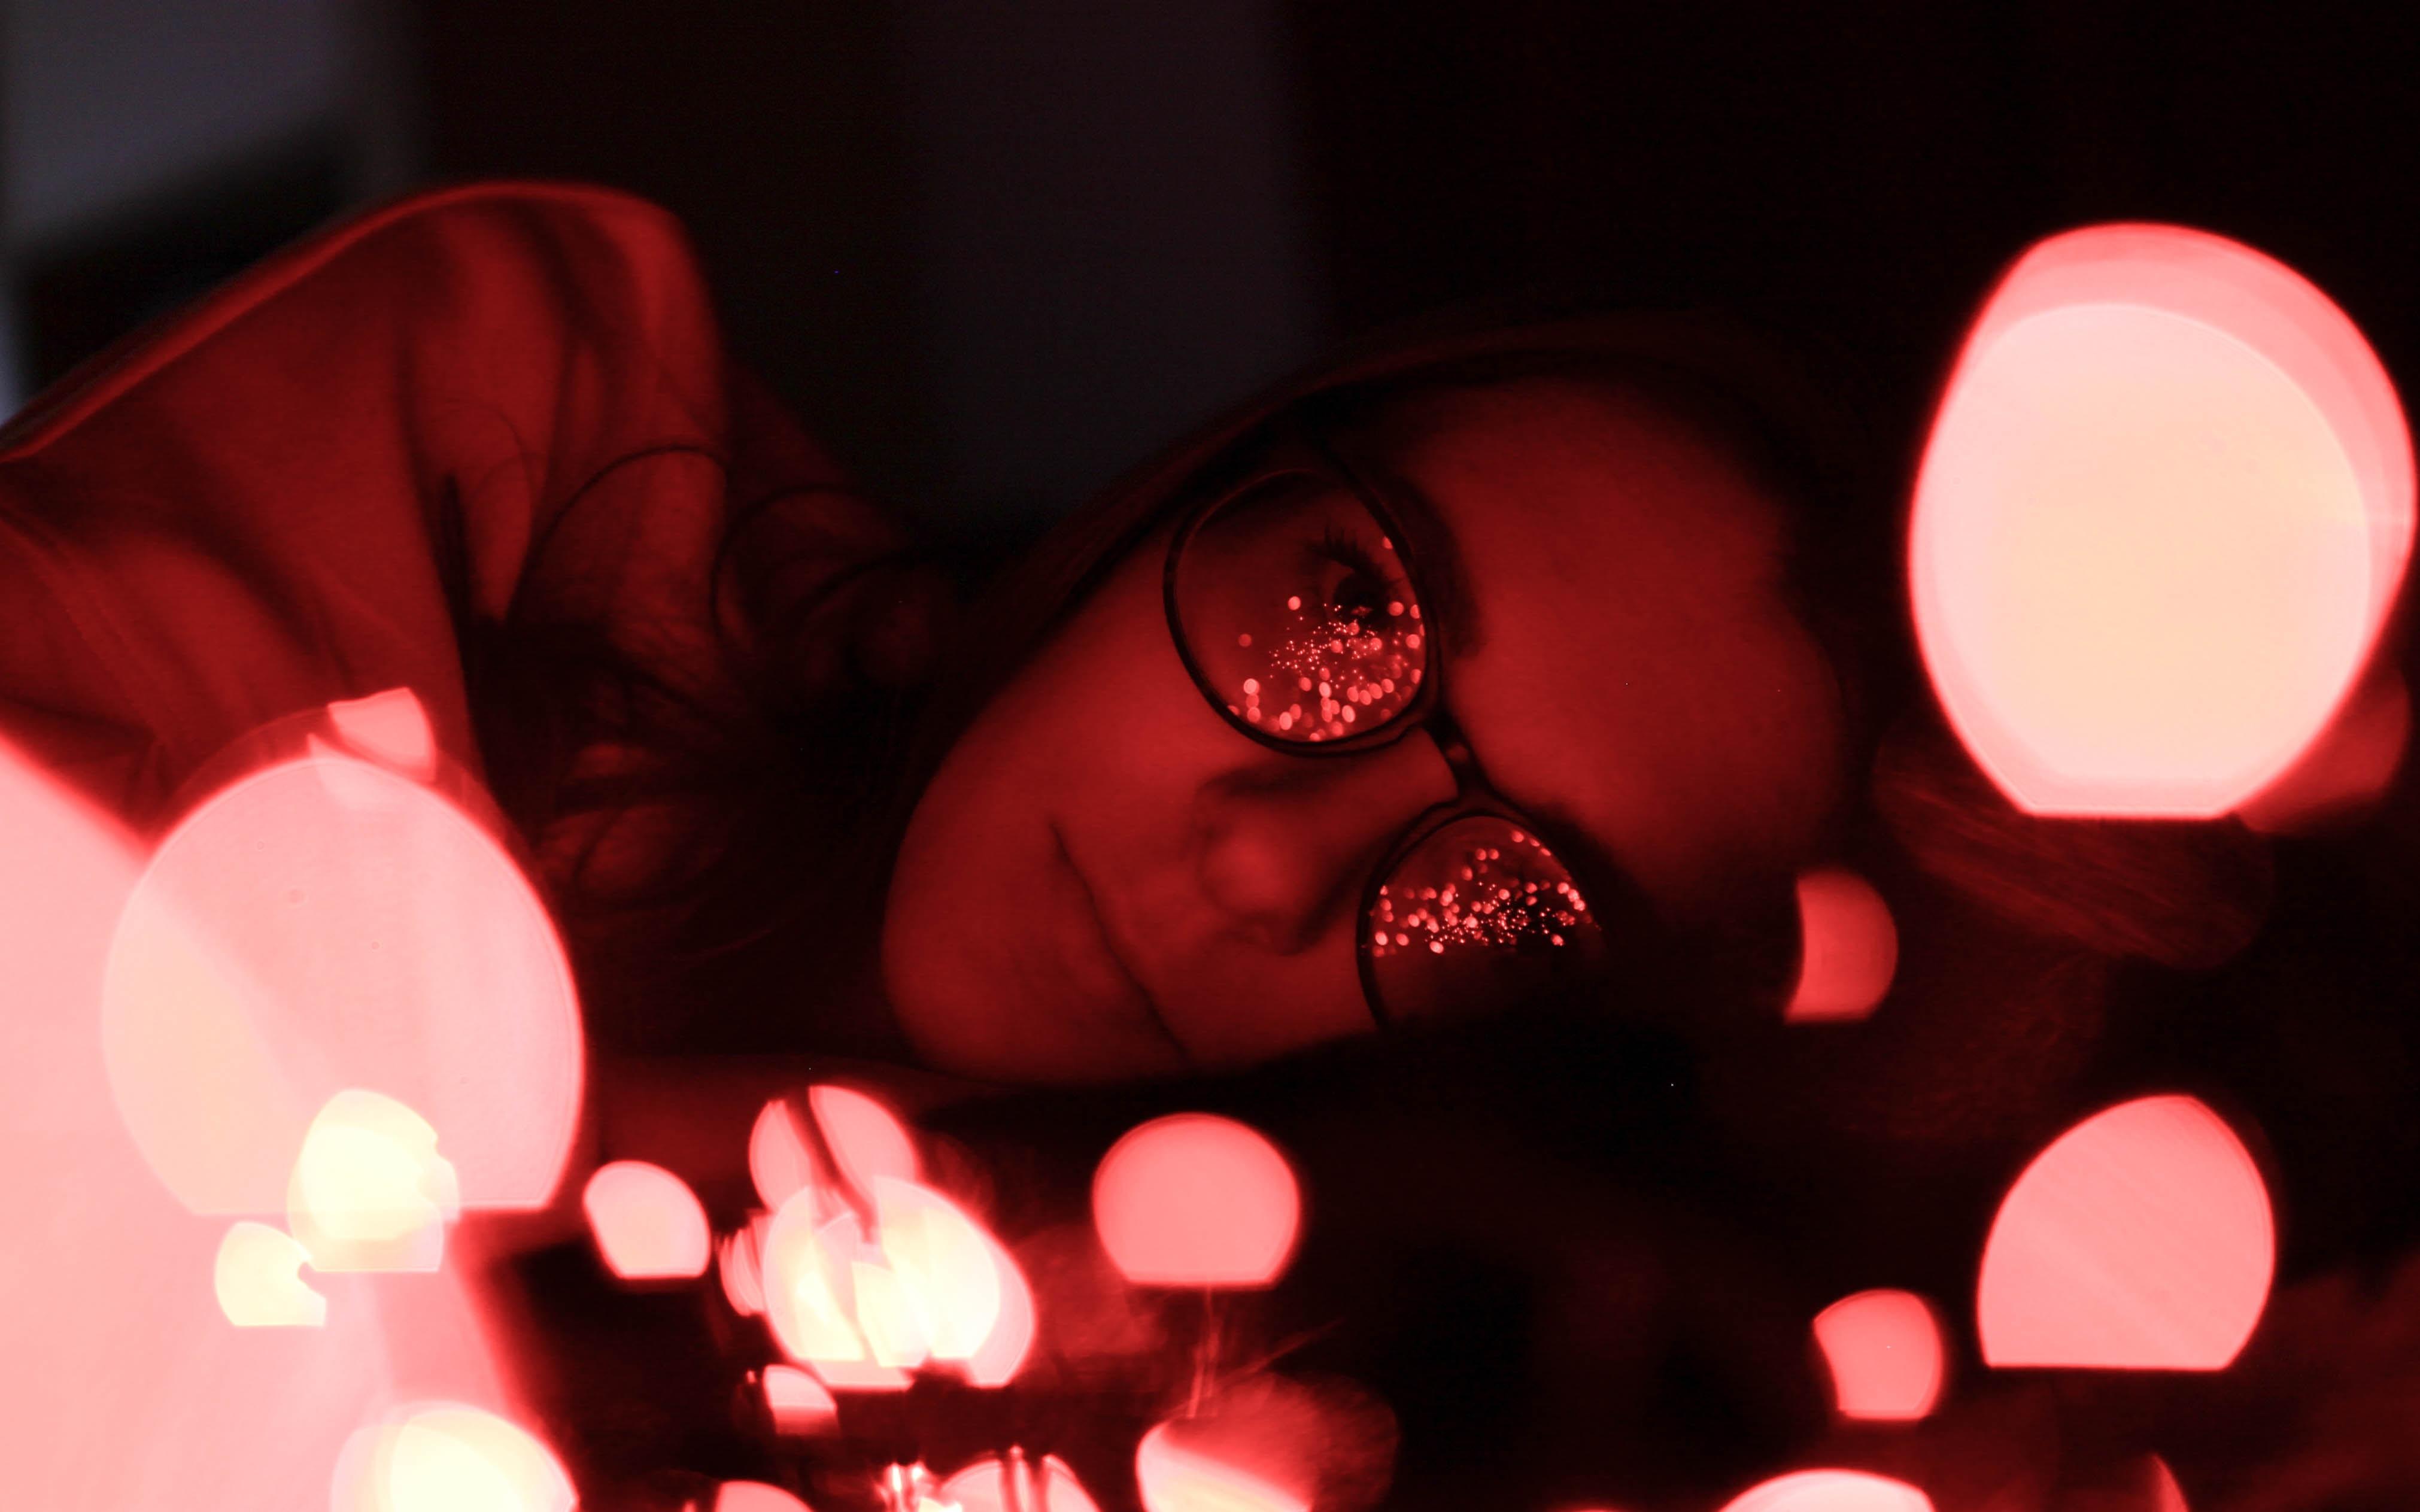 bokeh photography of woman wearing eyeglasses while lying